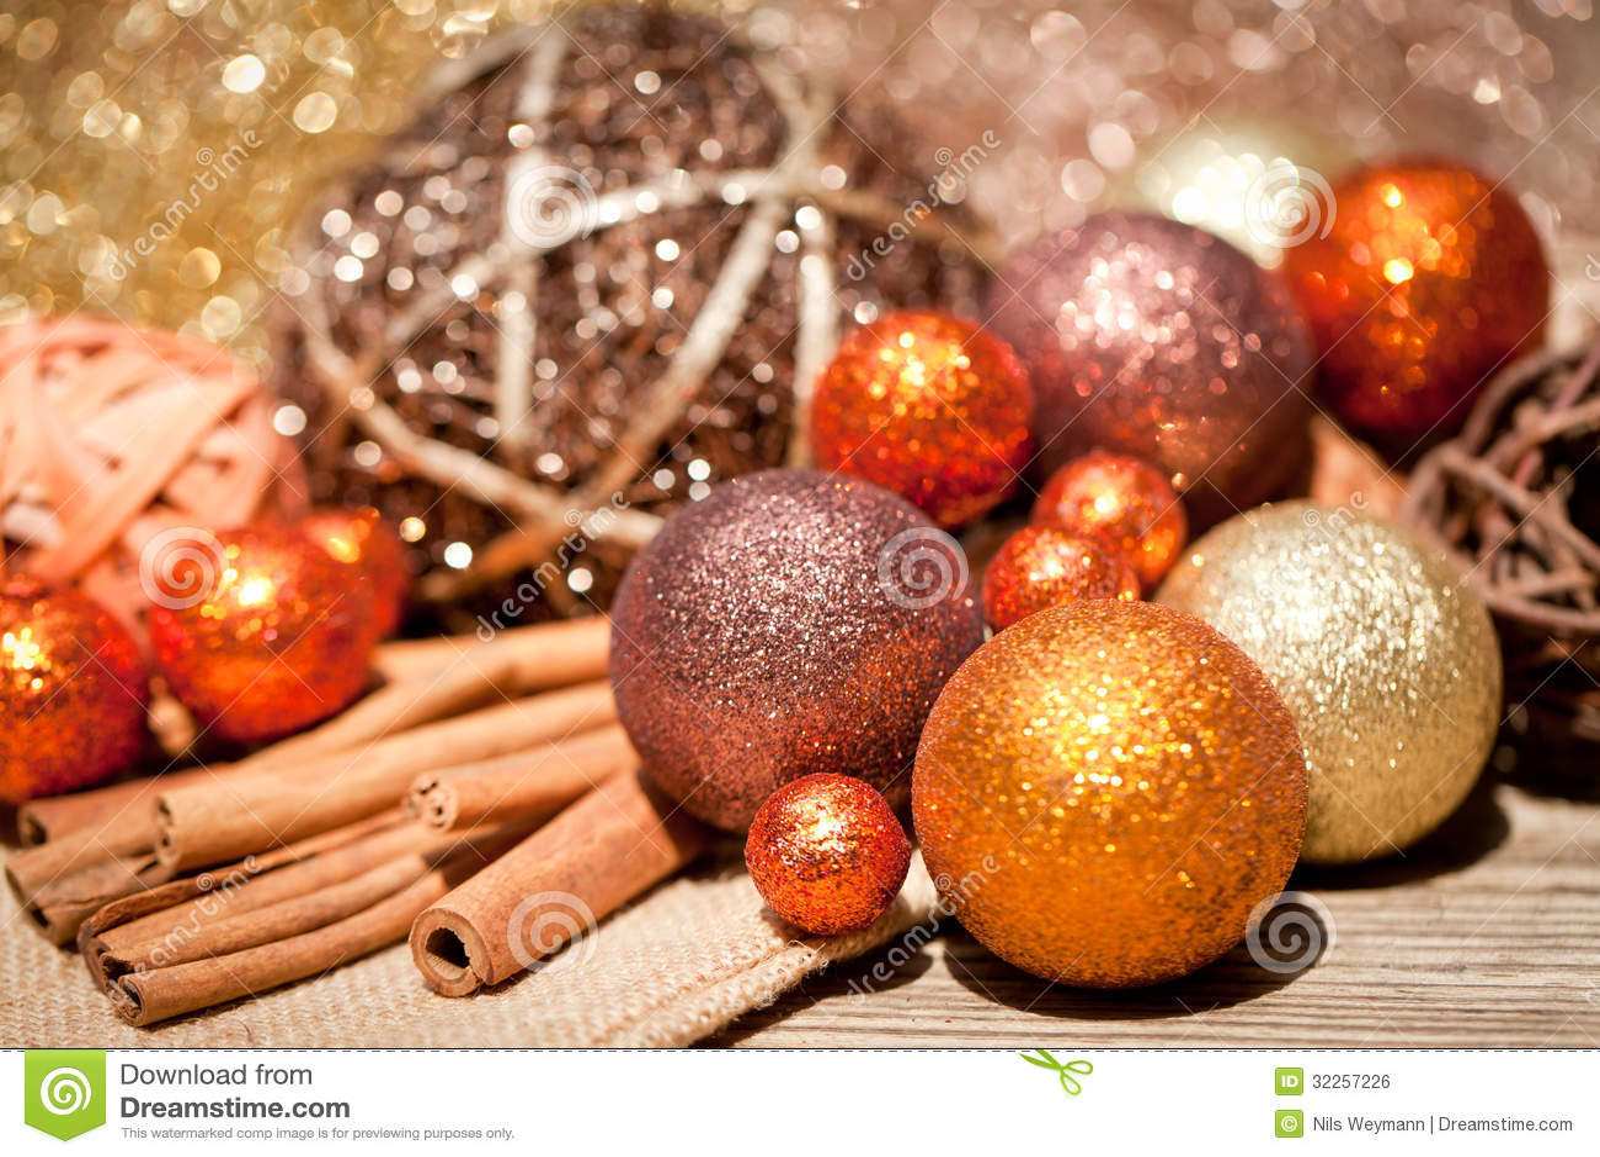 decoration noel orange Glittering Christmas Decoration In Orange And Brown Natural Wood  decoration noel orange